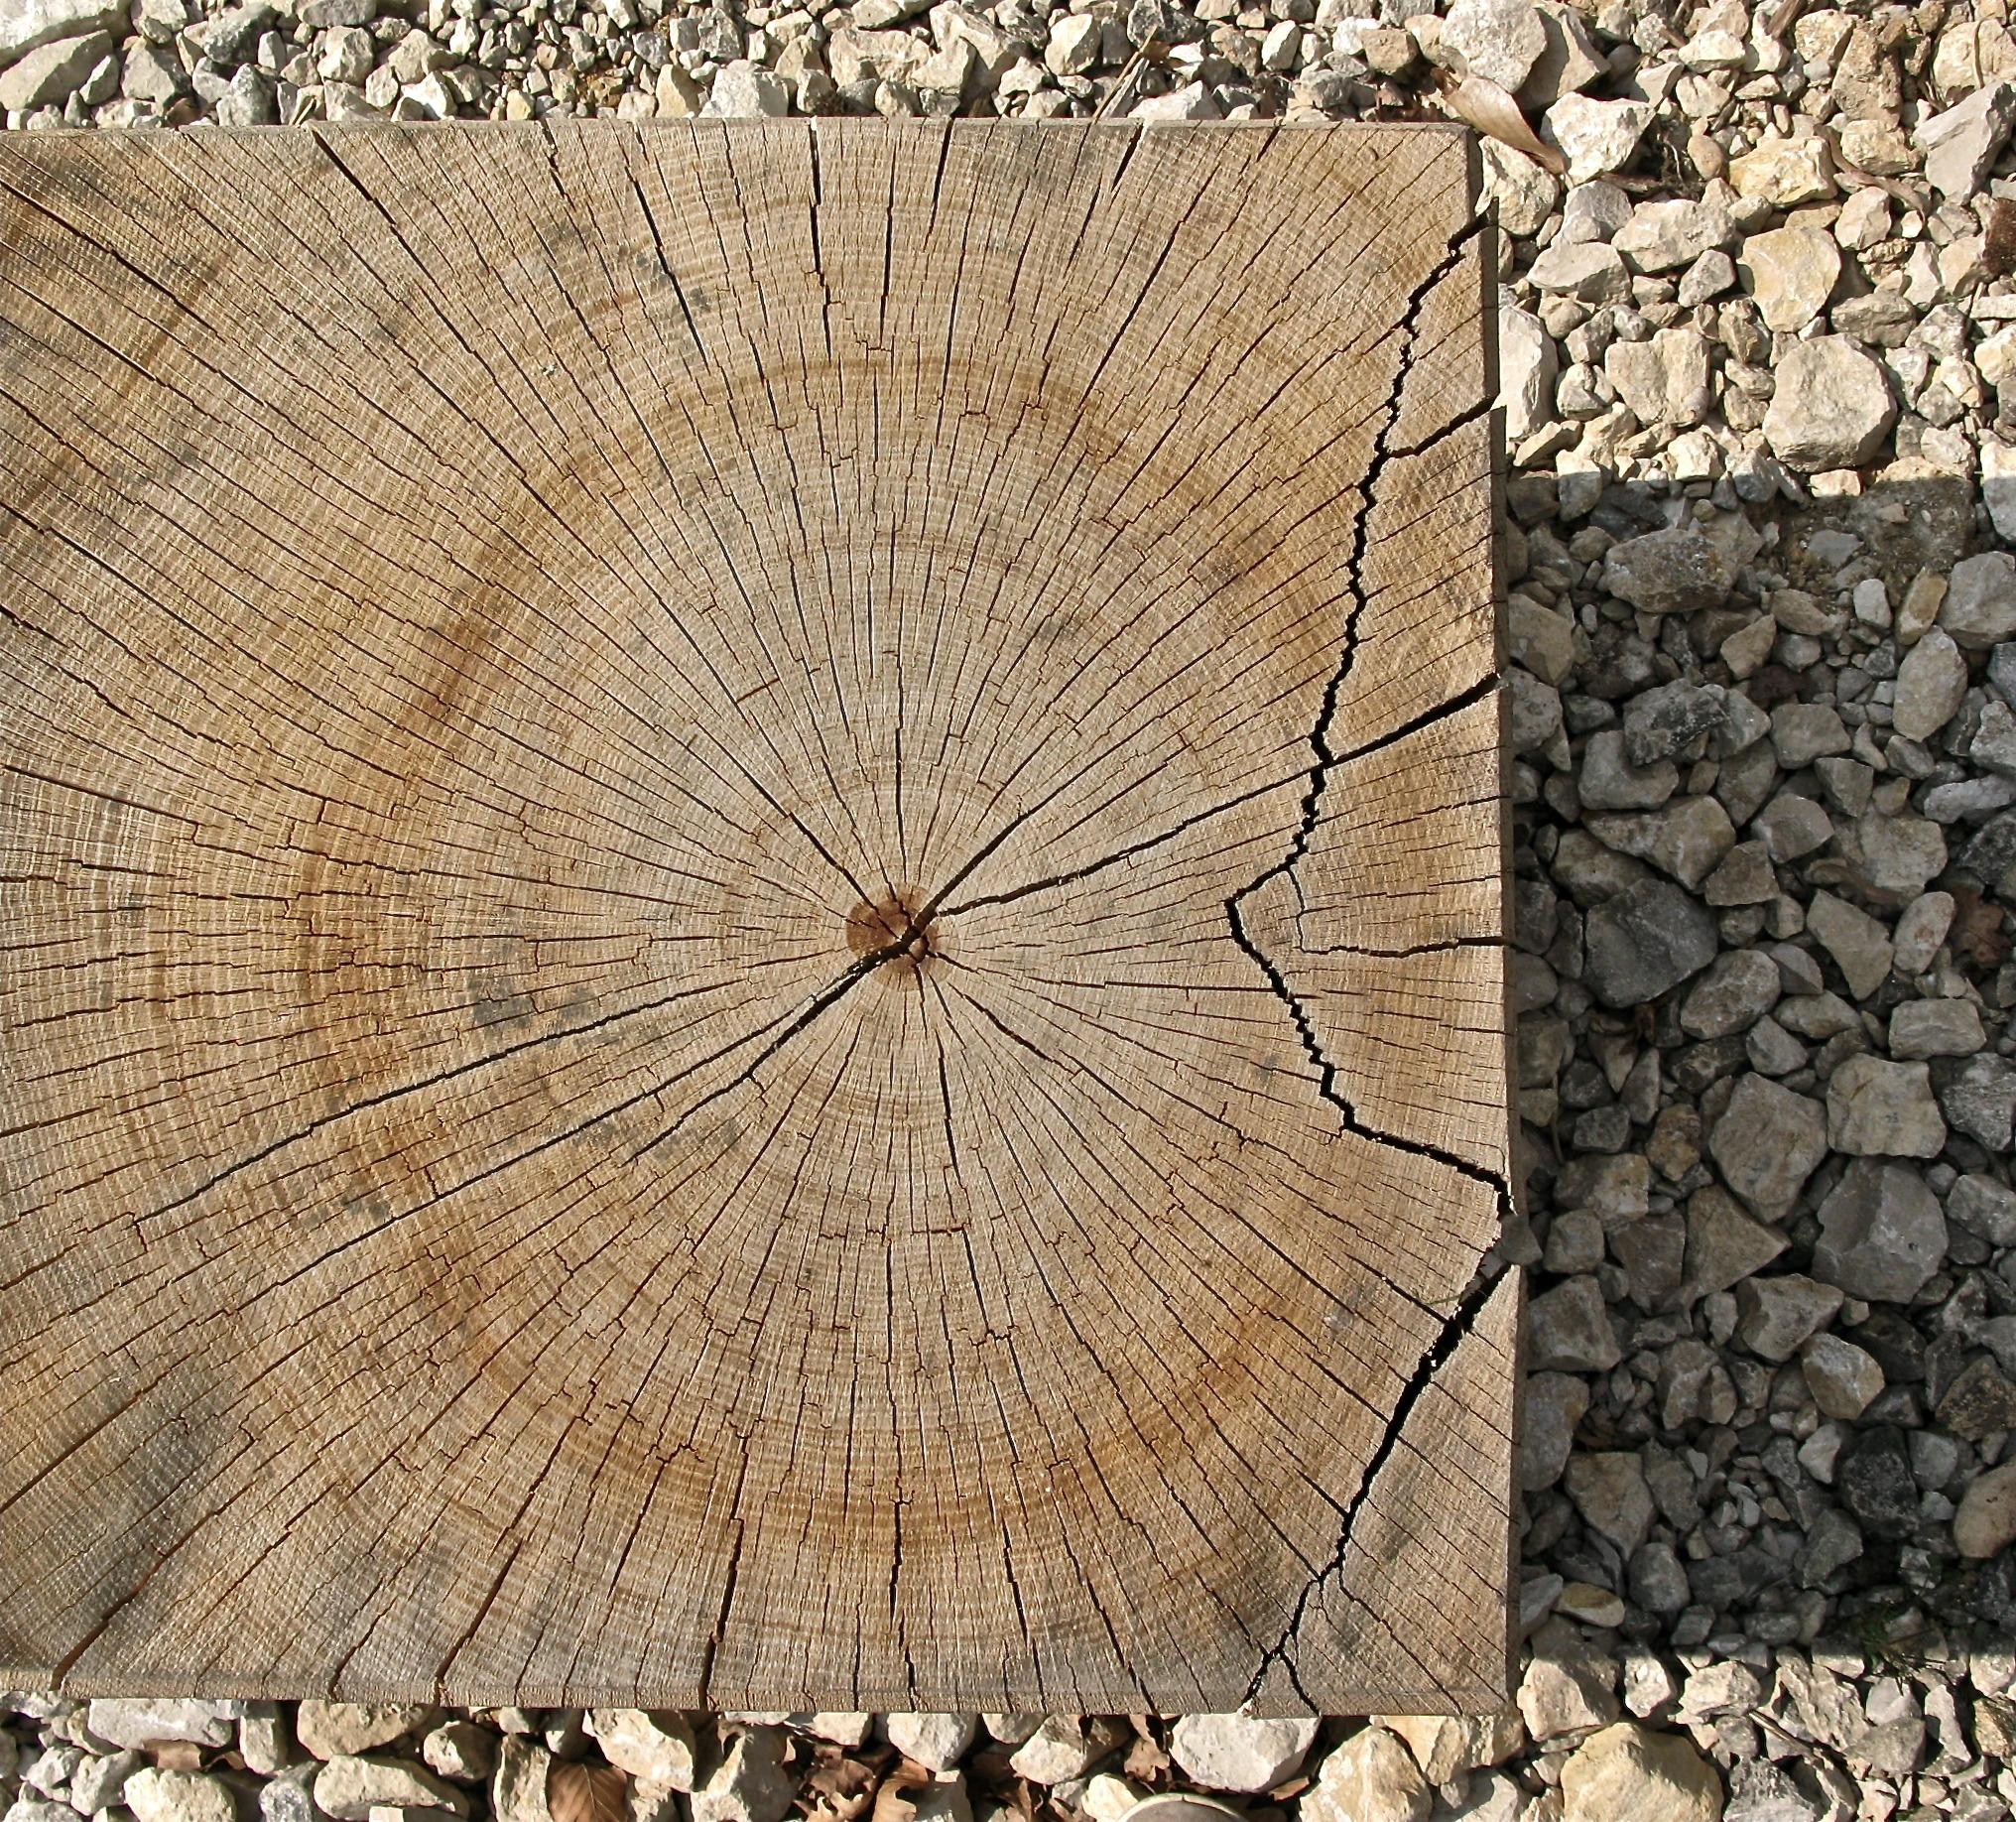 Fotos gratis : árbol, naturaleza, estructura, madera, el maletero ...